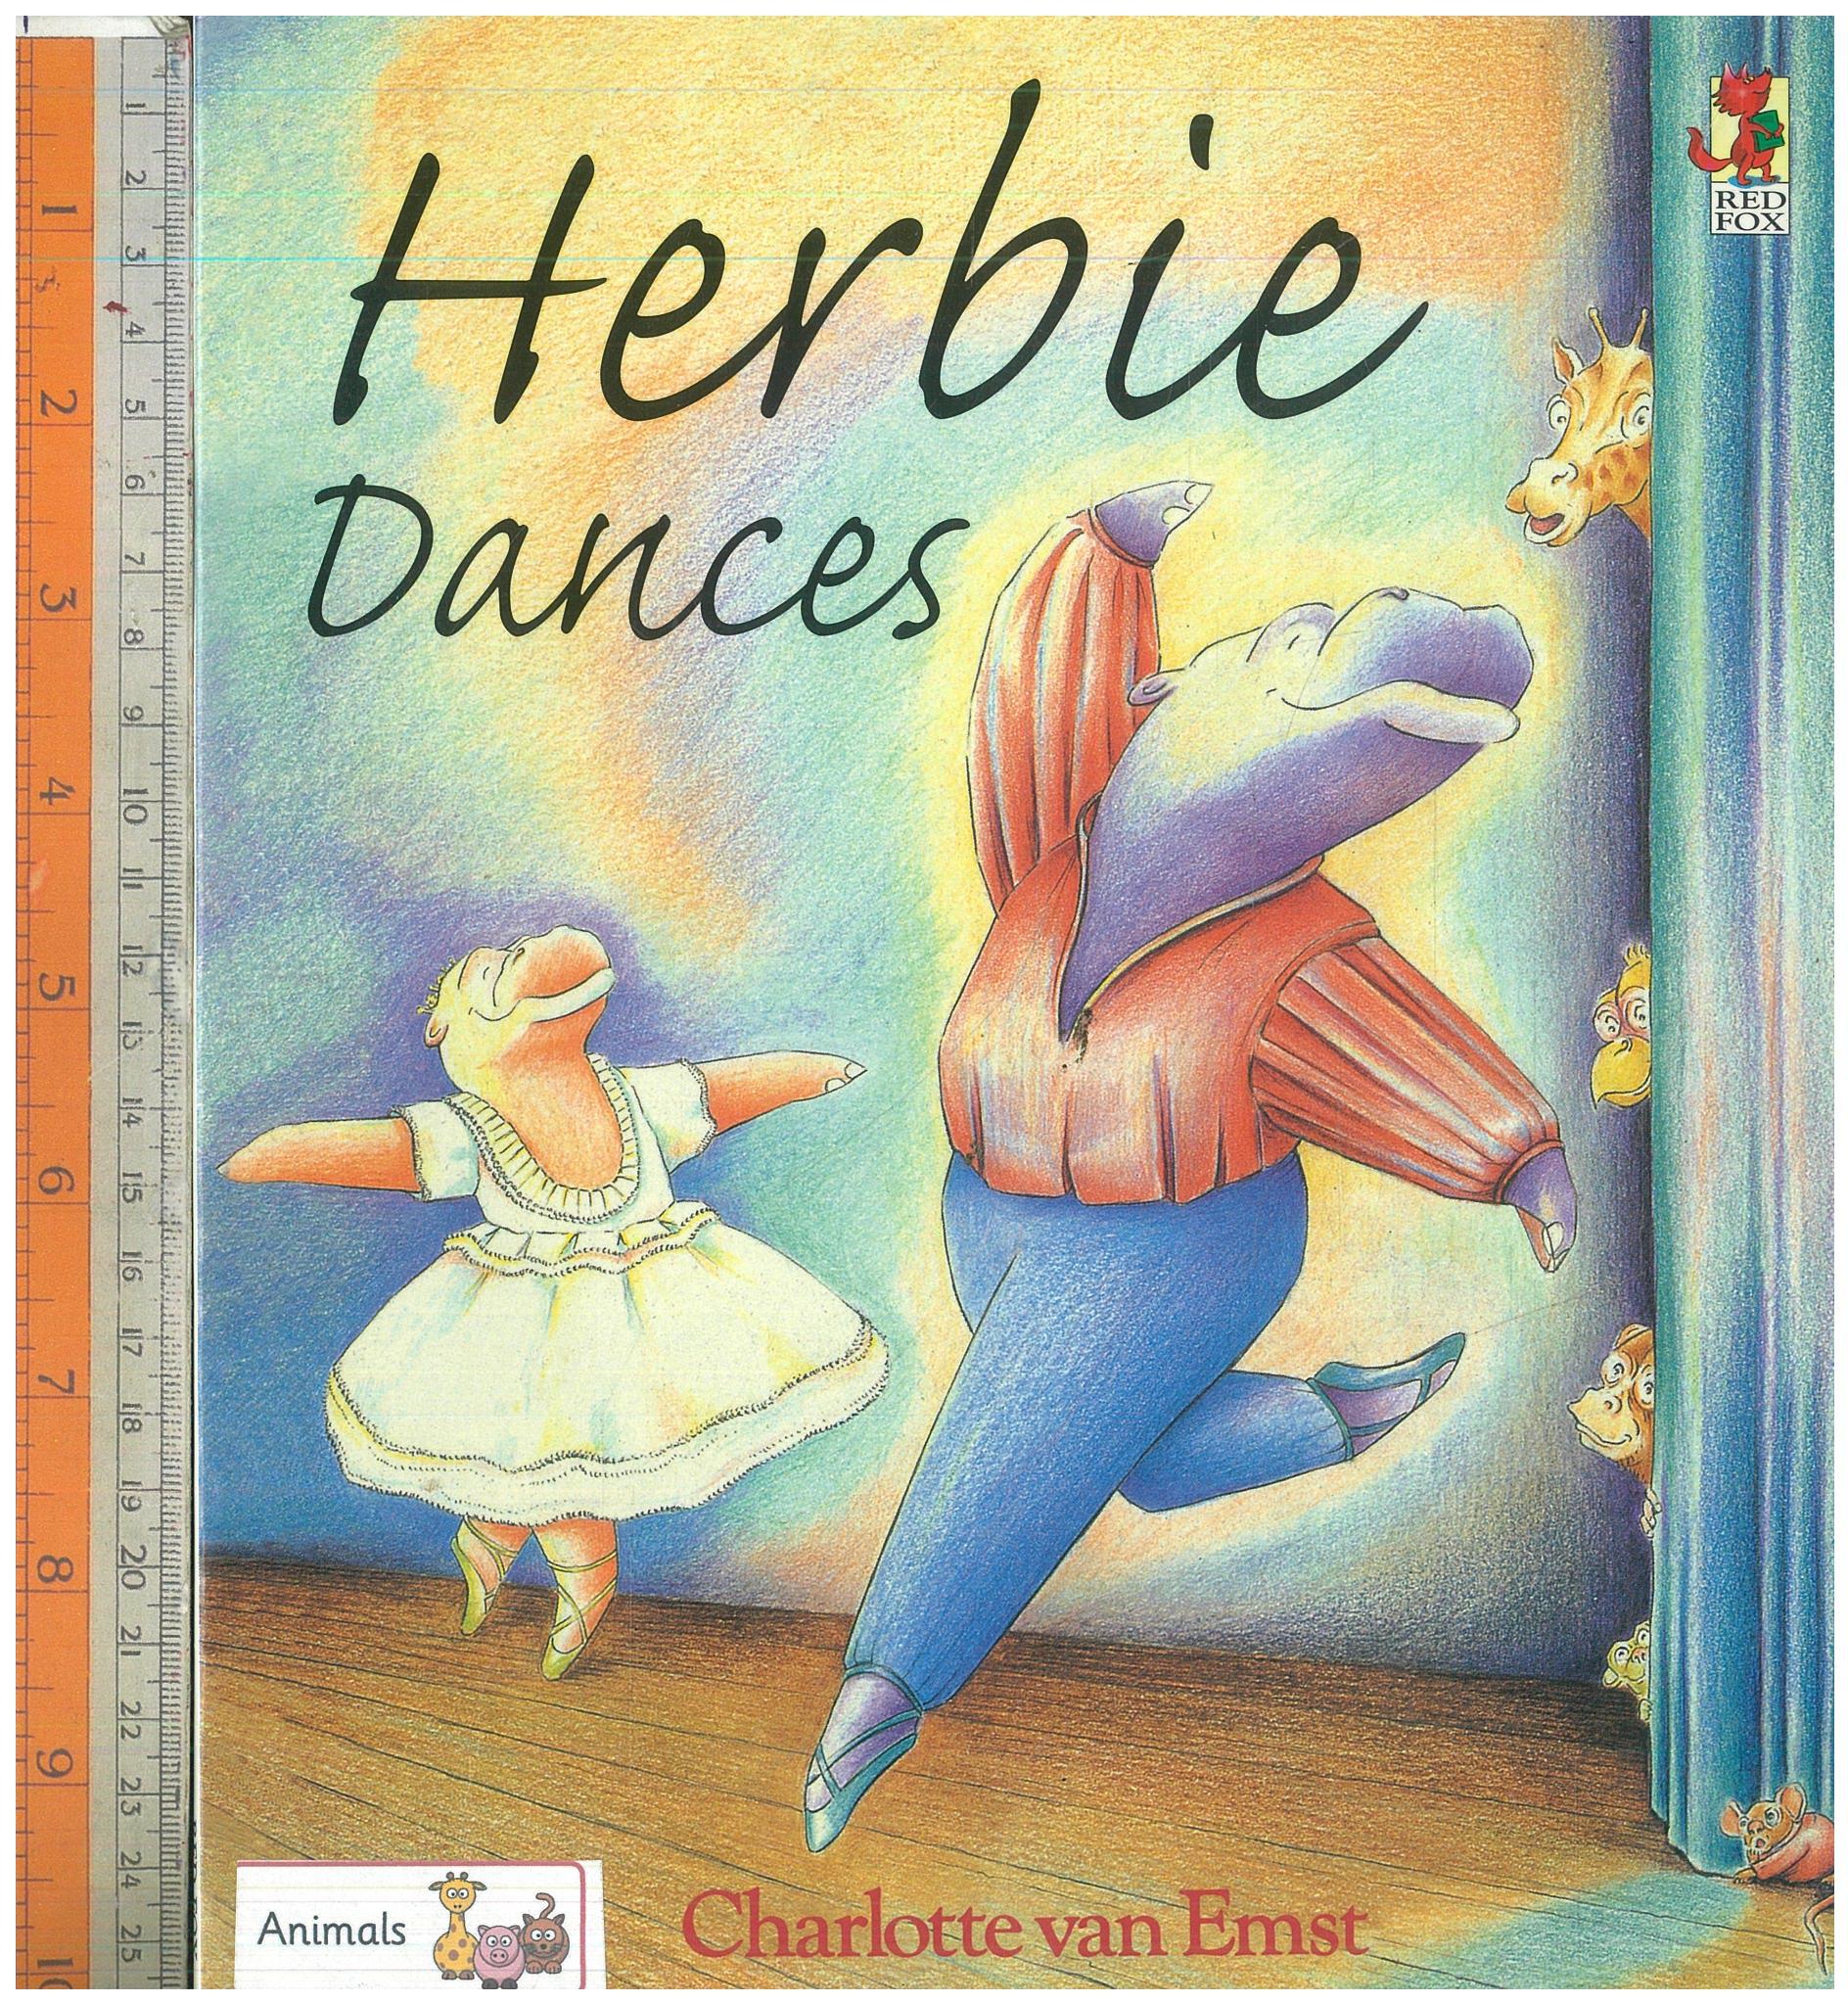 Herbie Dances